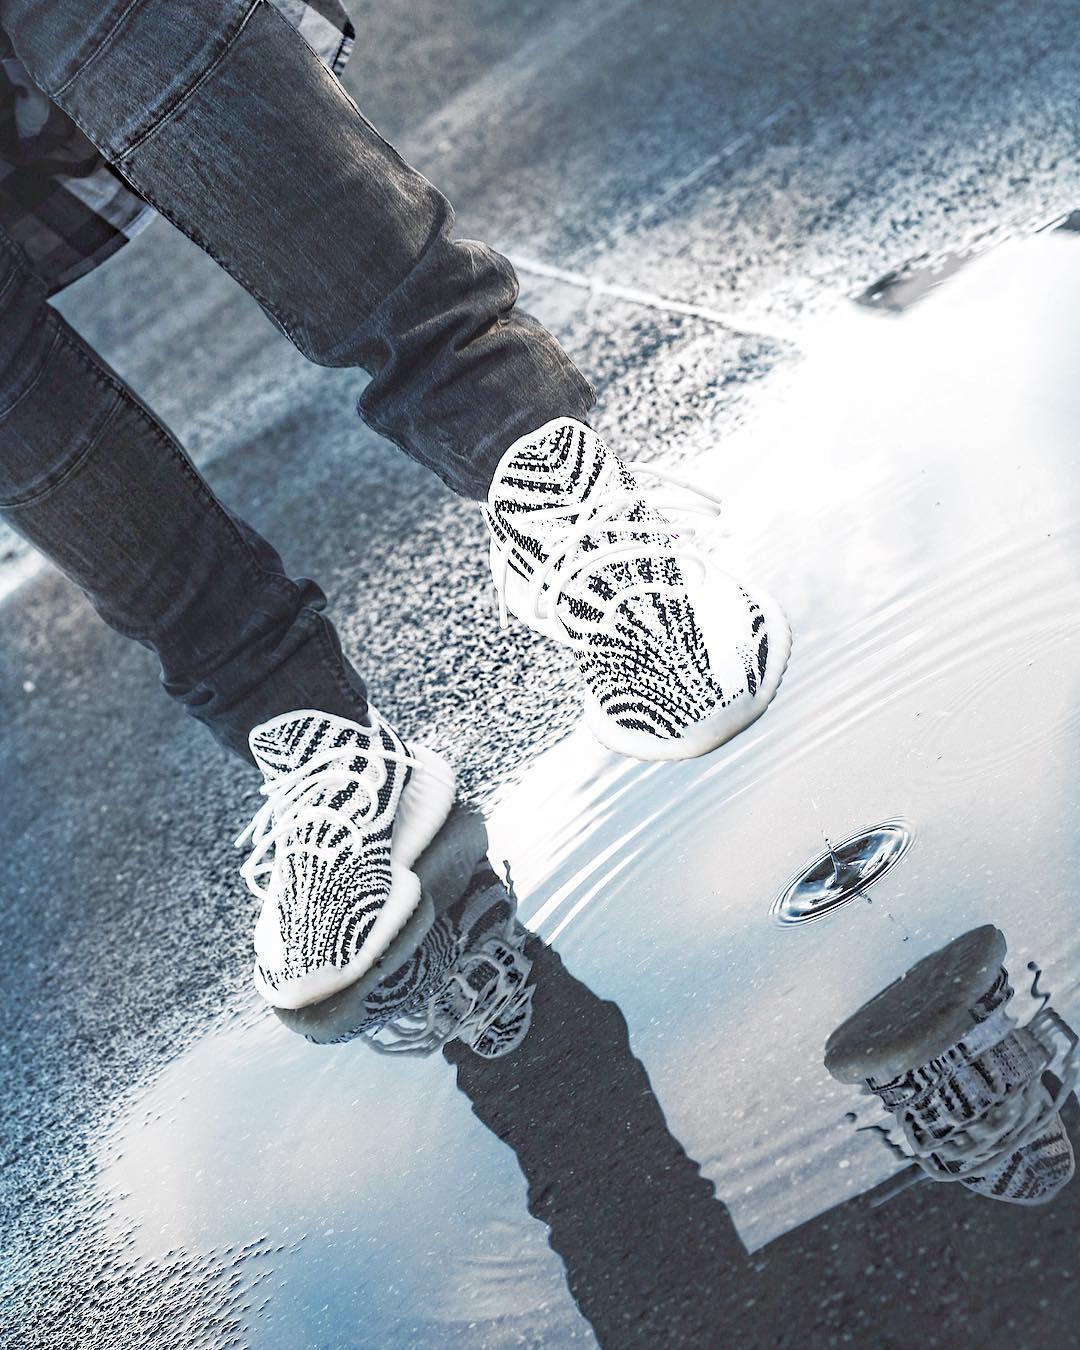 cf06041d5 Whiteoptix - Adidas Yeezy boost 350 zebra sneaker by Kanye West. Hypebeast